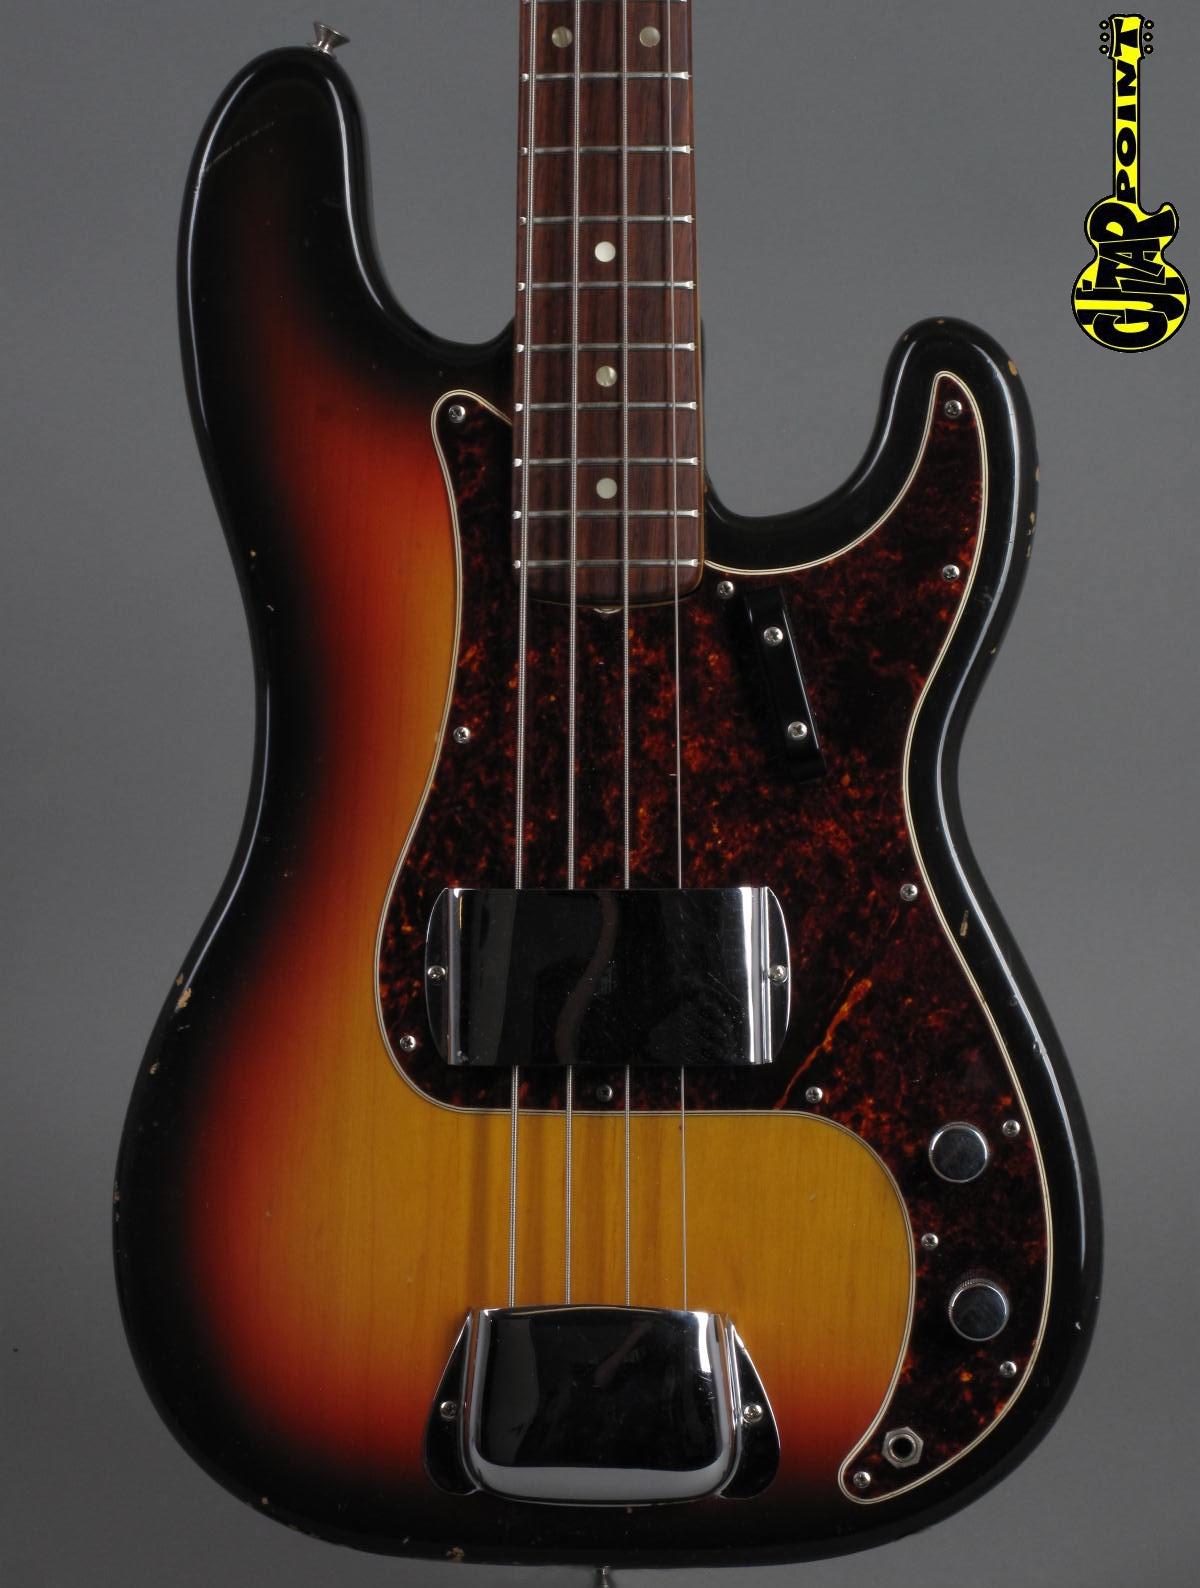 1968 Fender Precision Bass - 3t-Sunburst